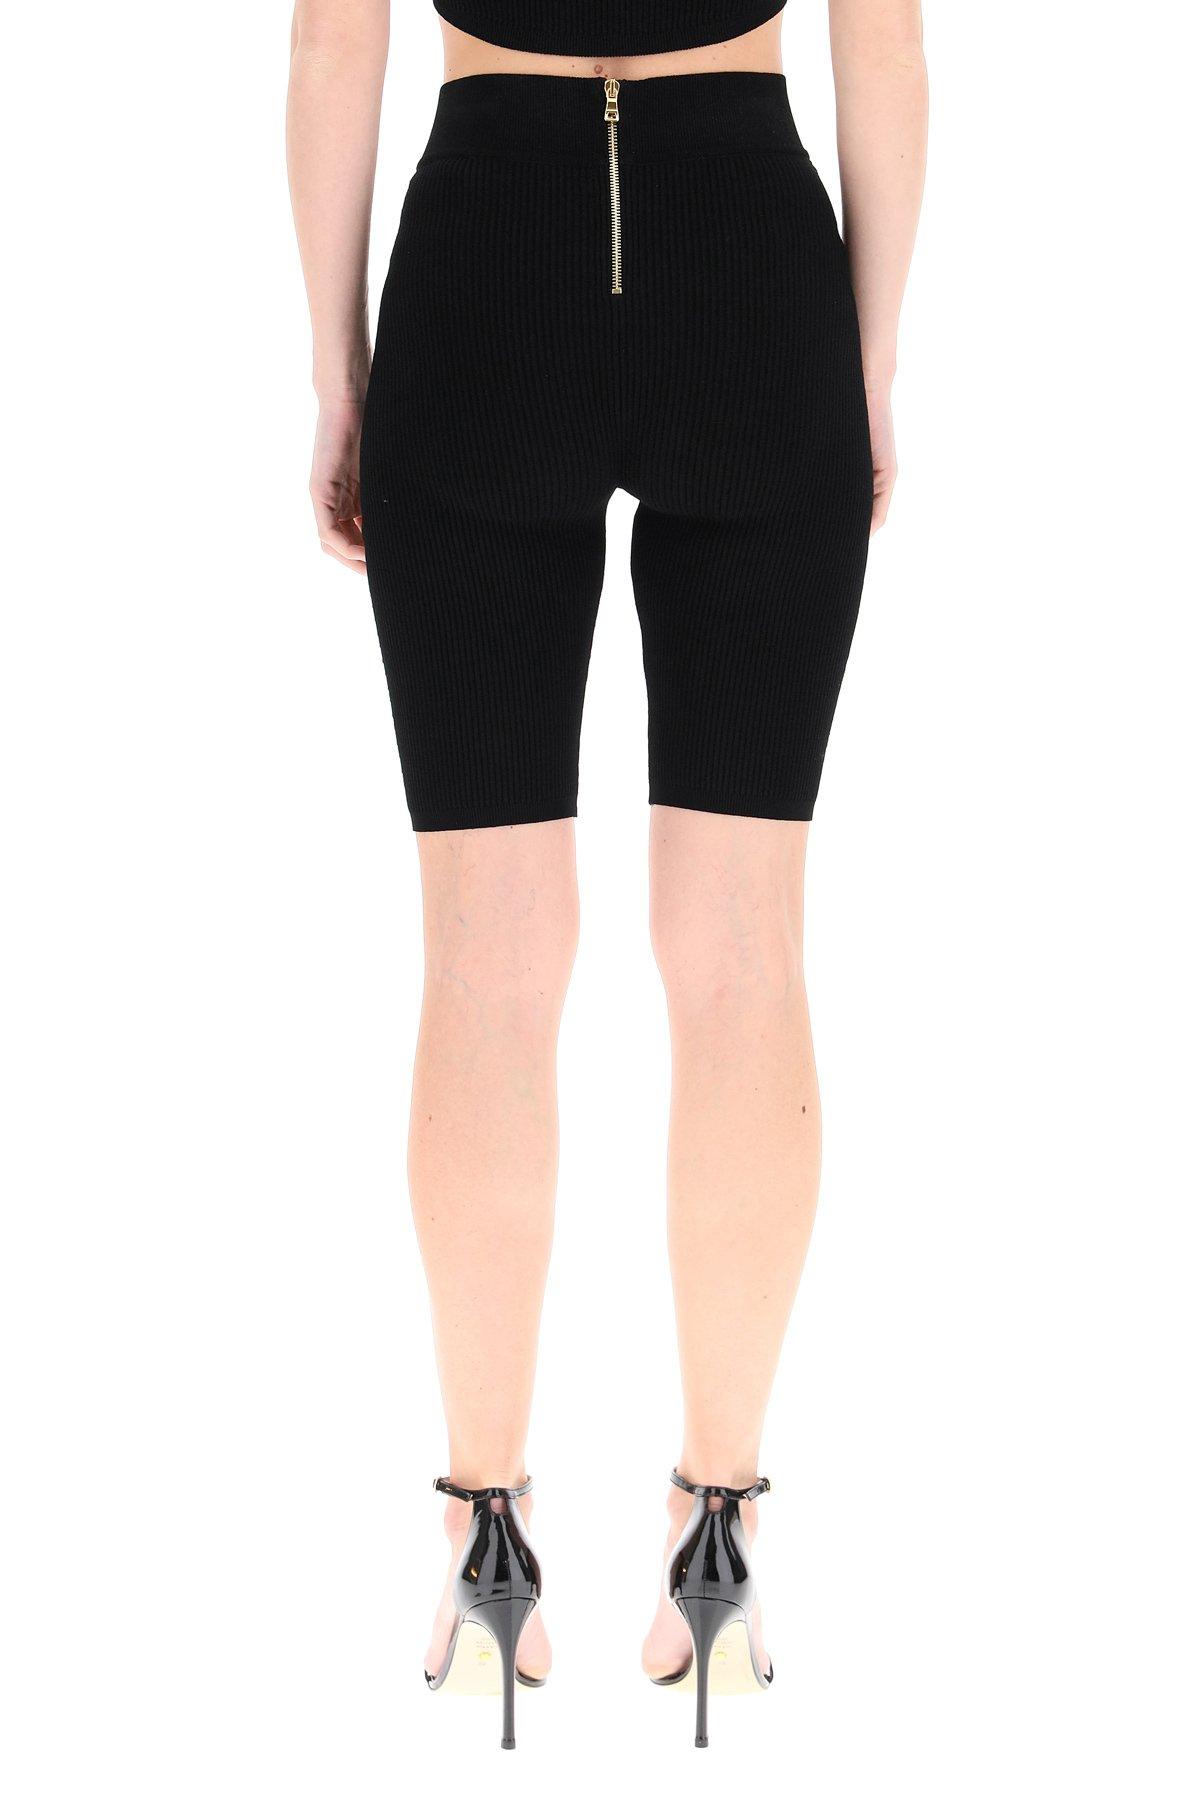 Balmain shorts a costine